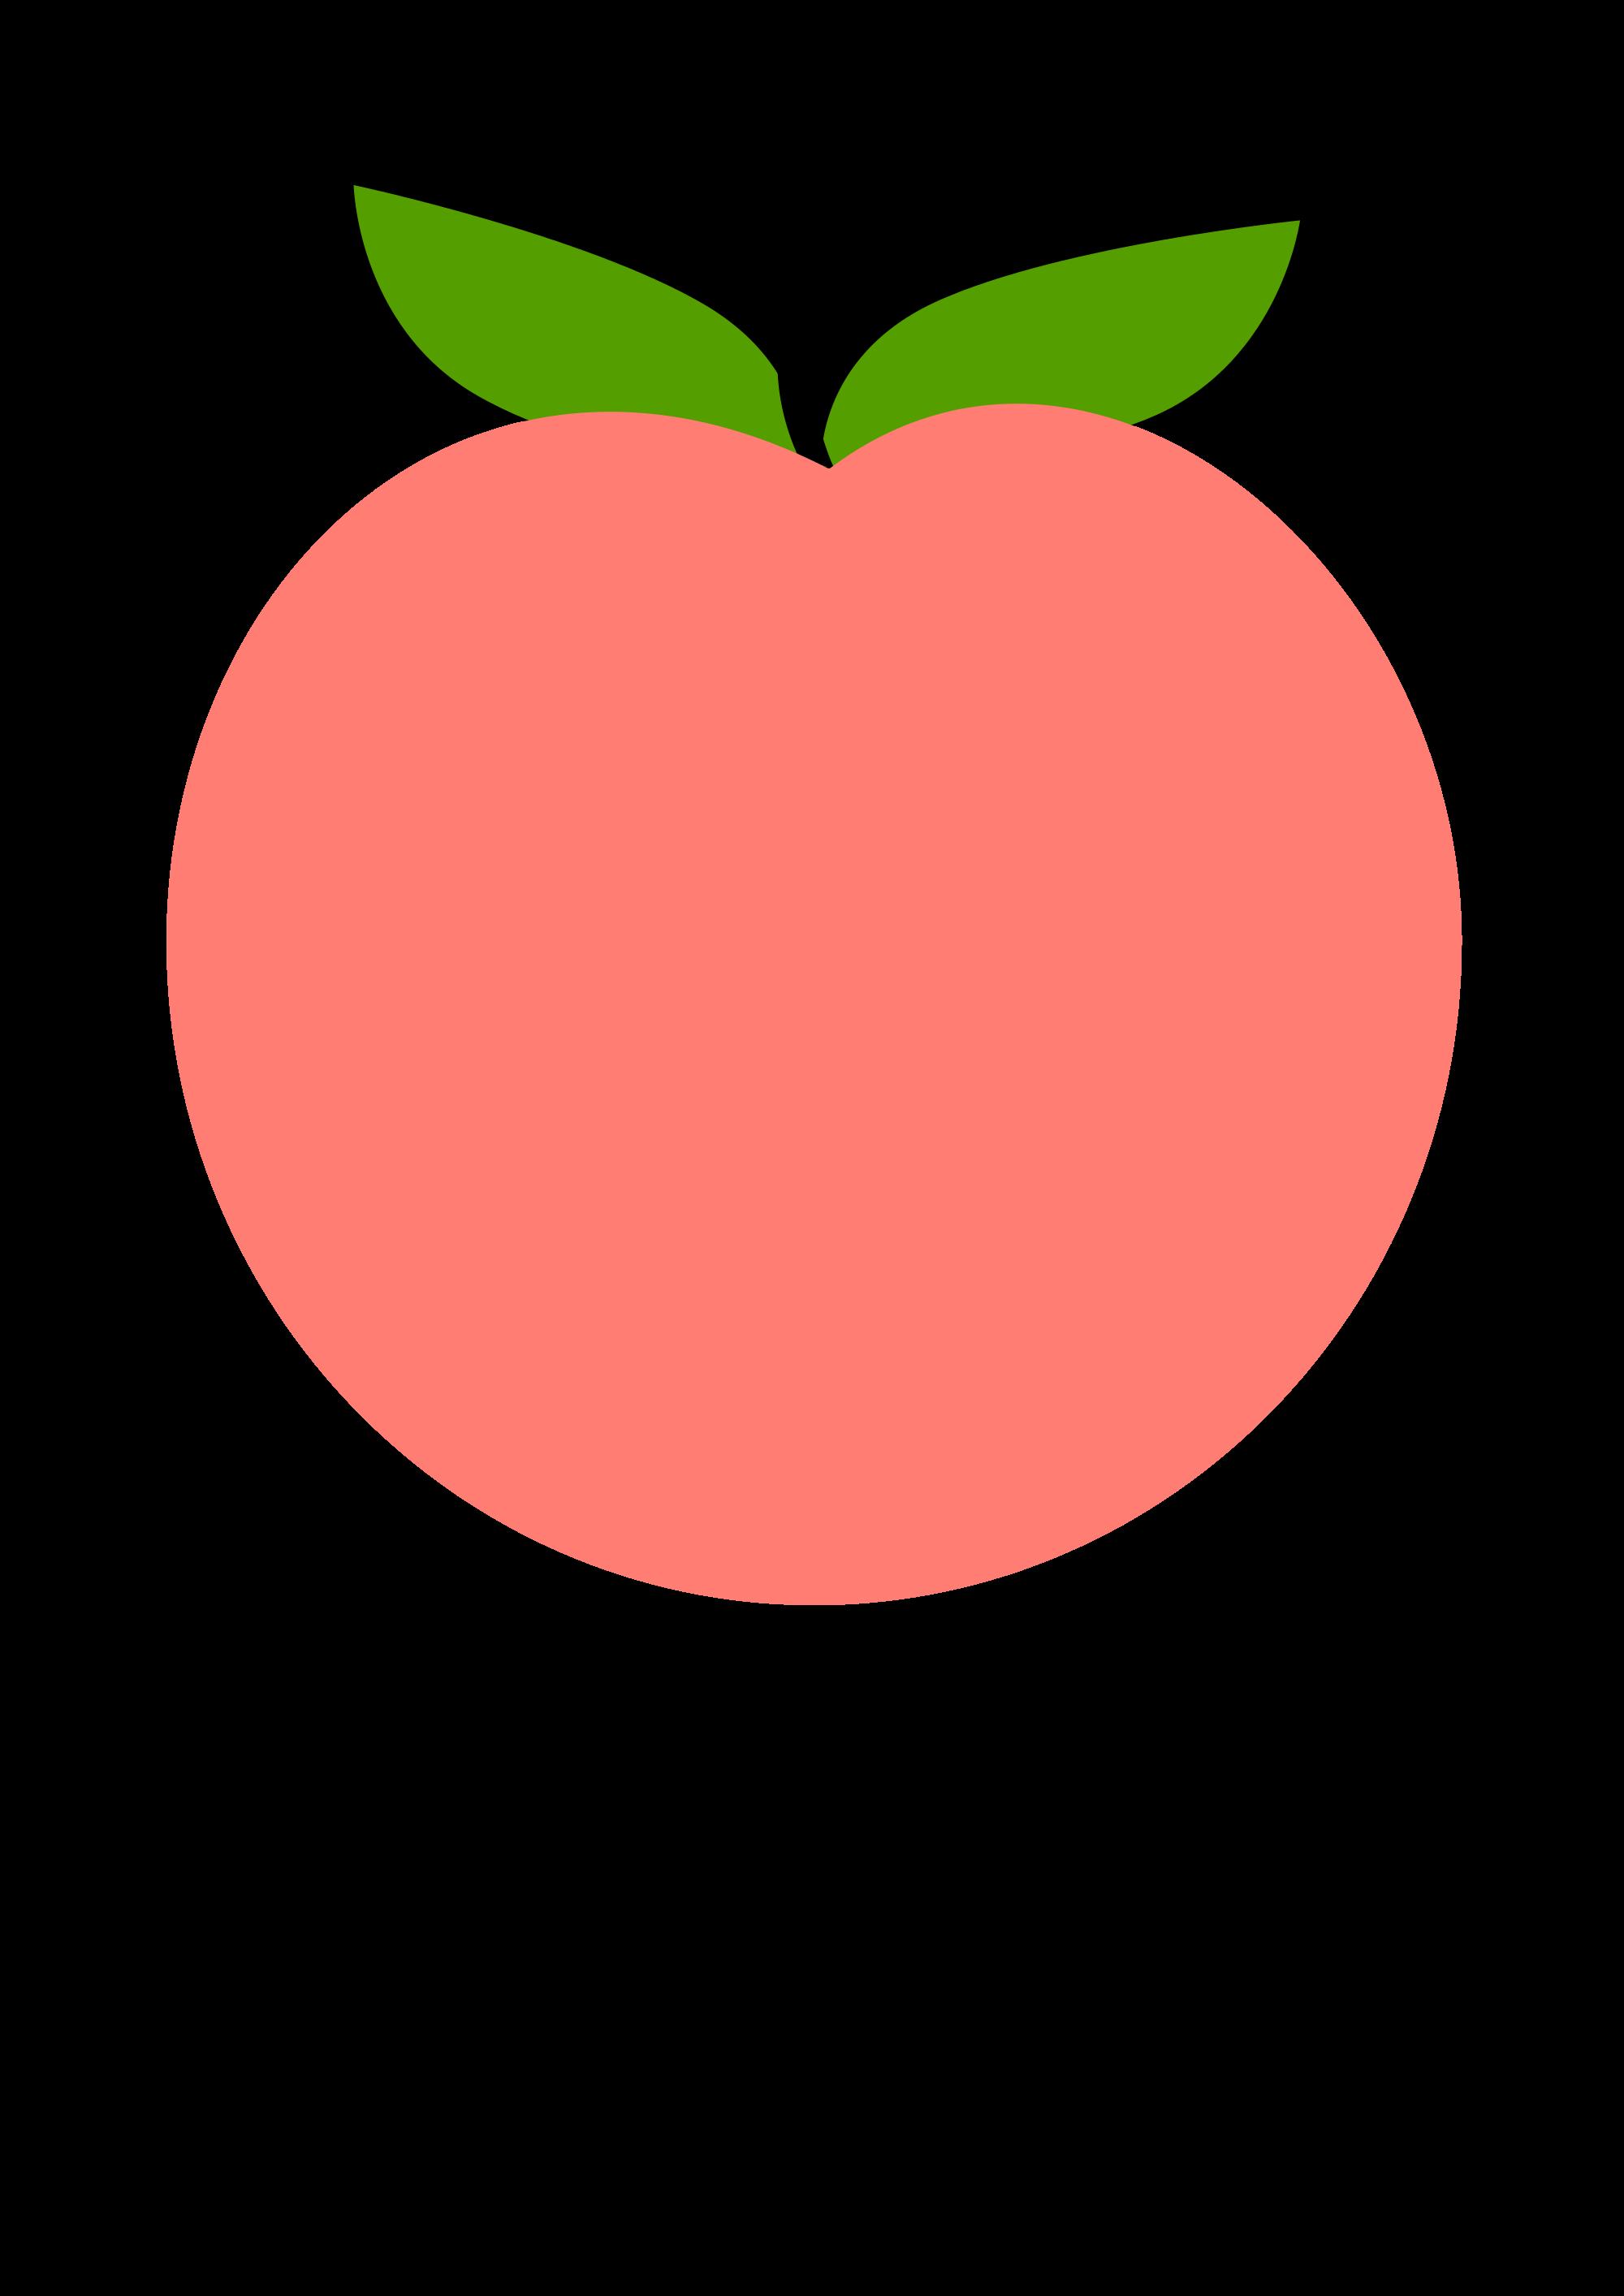 Peach clipart svg. File tux paint wikimedia